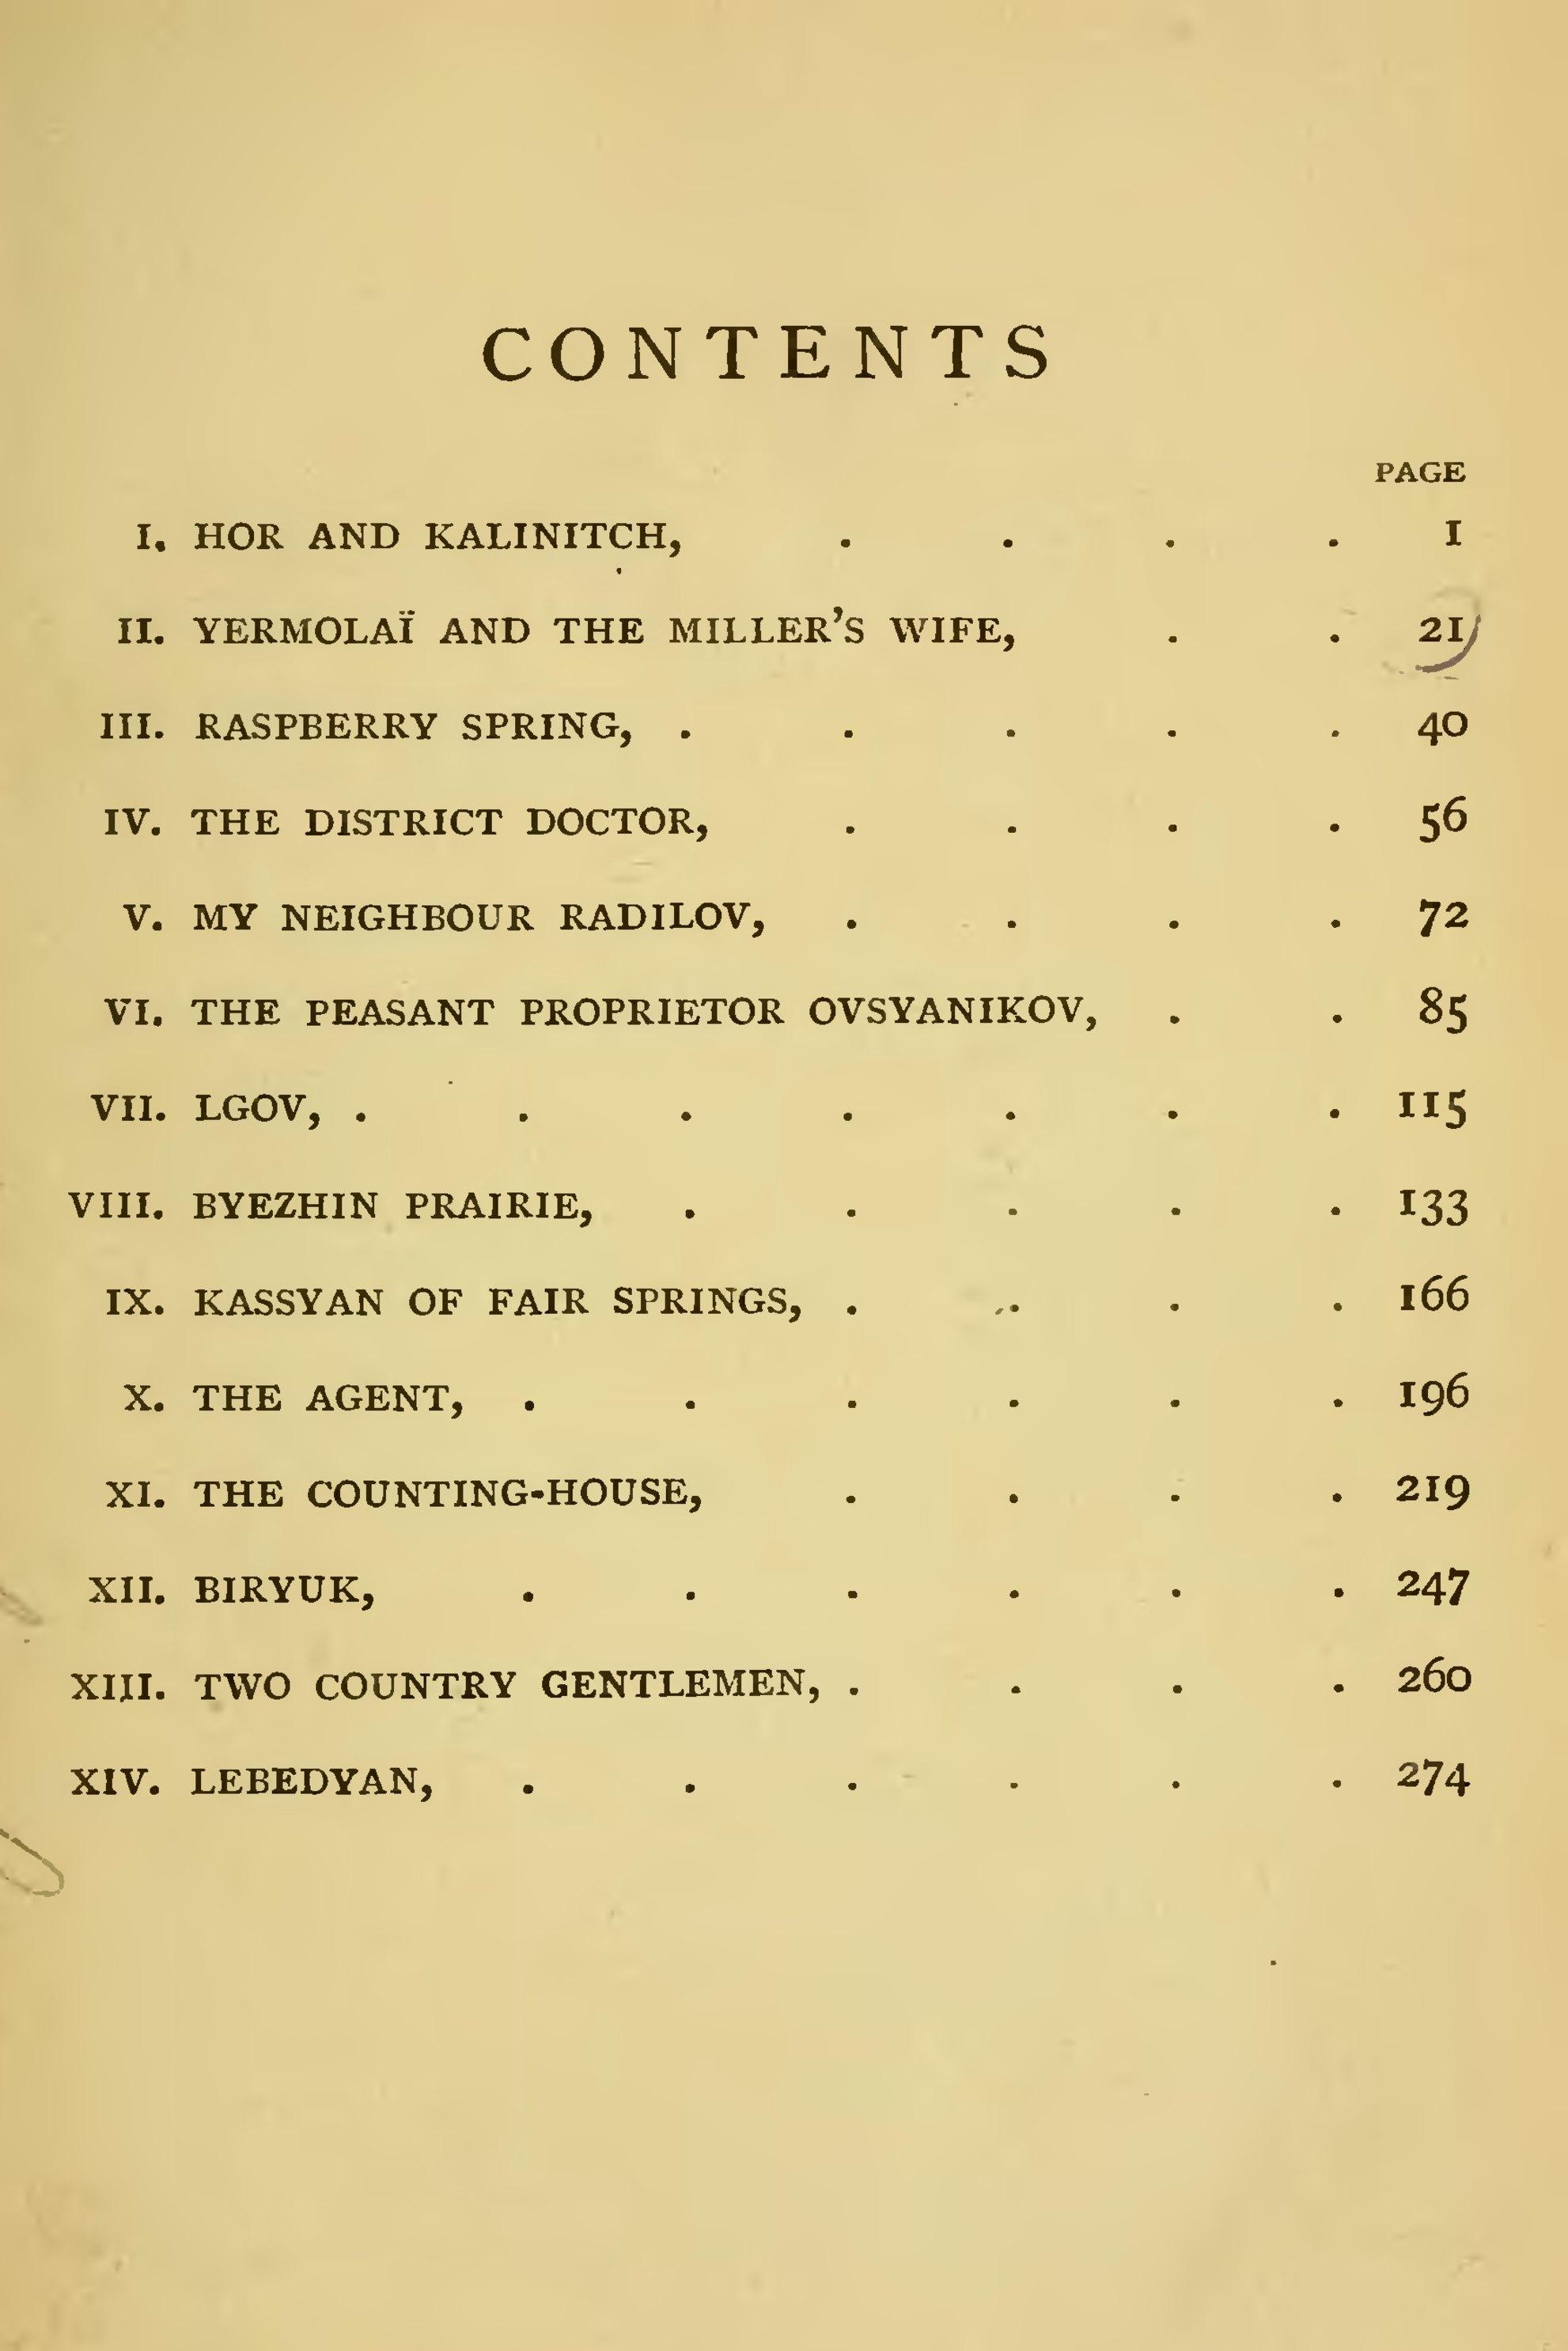 I. Turgenev, Biryuk: what is the main theme of the story 61